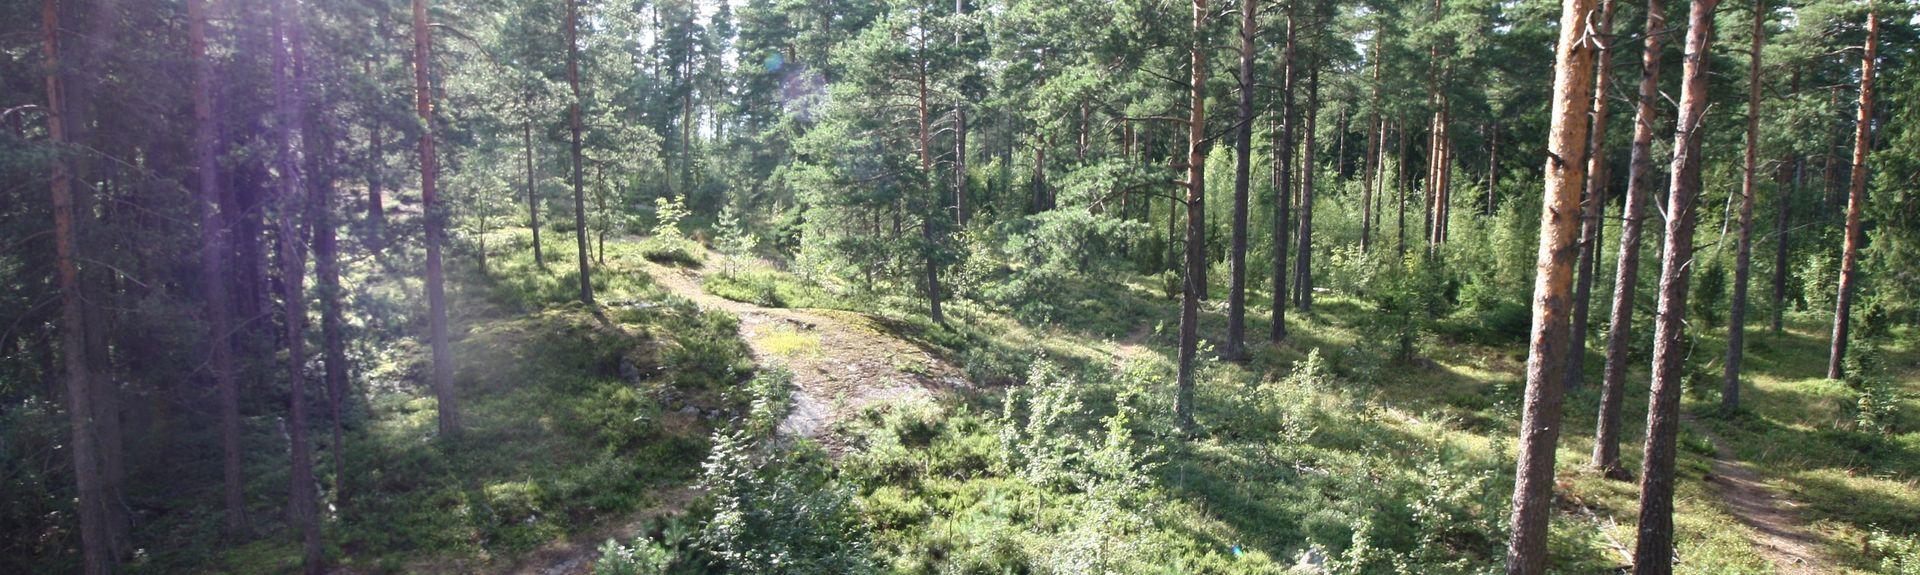 Espoo, Uusimaa, Suomi